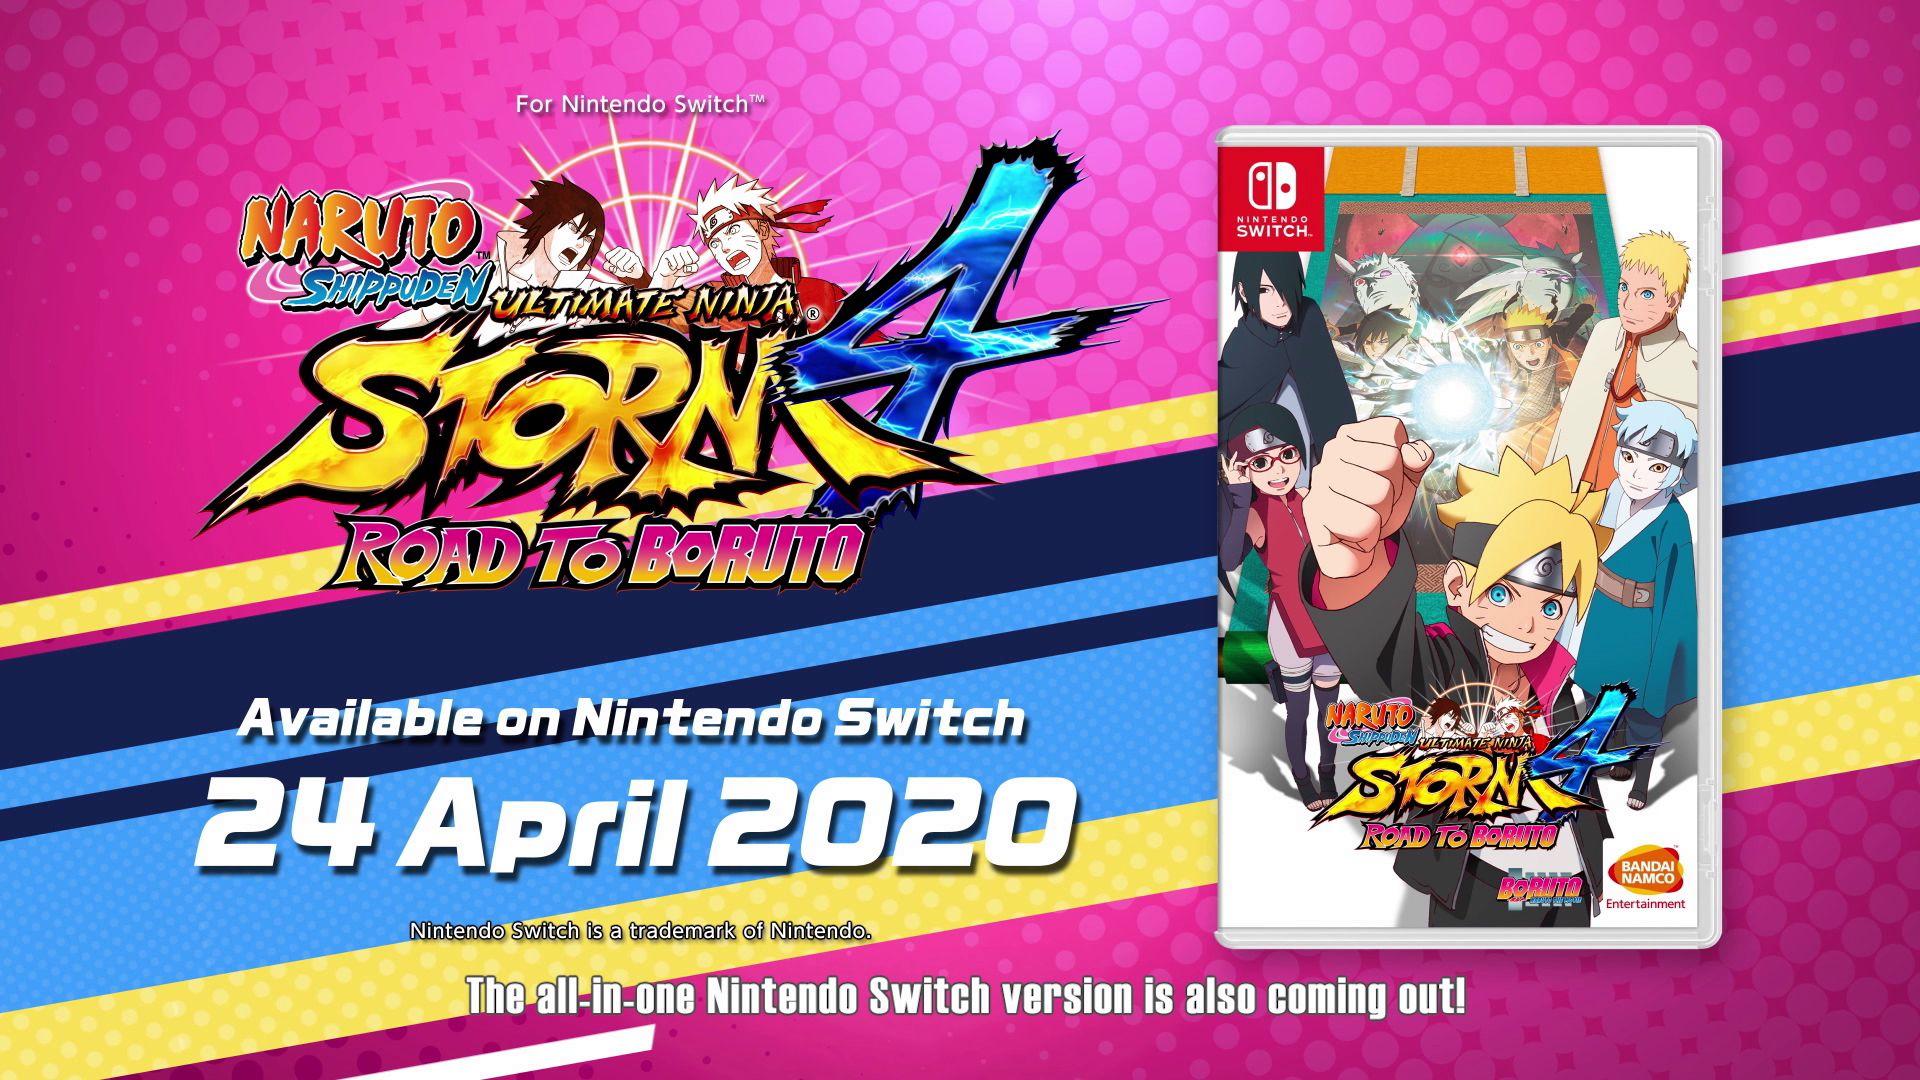 NARUTO SHIPPUDEN: Ultimate Ninja STORM 4 ROAD TO BORUTO arriva su Nintendo Switch il 24 aprile 2020!